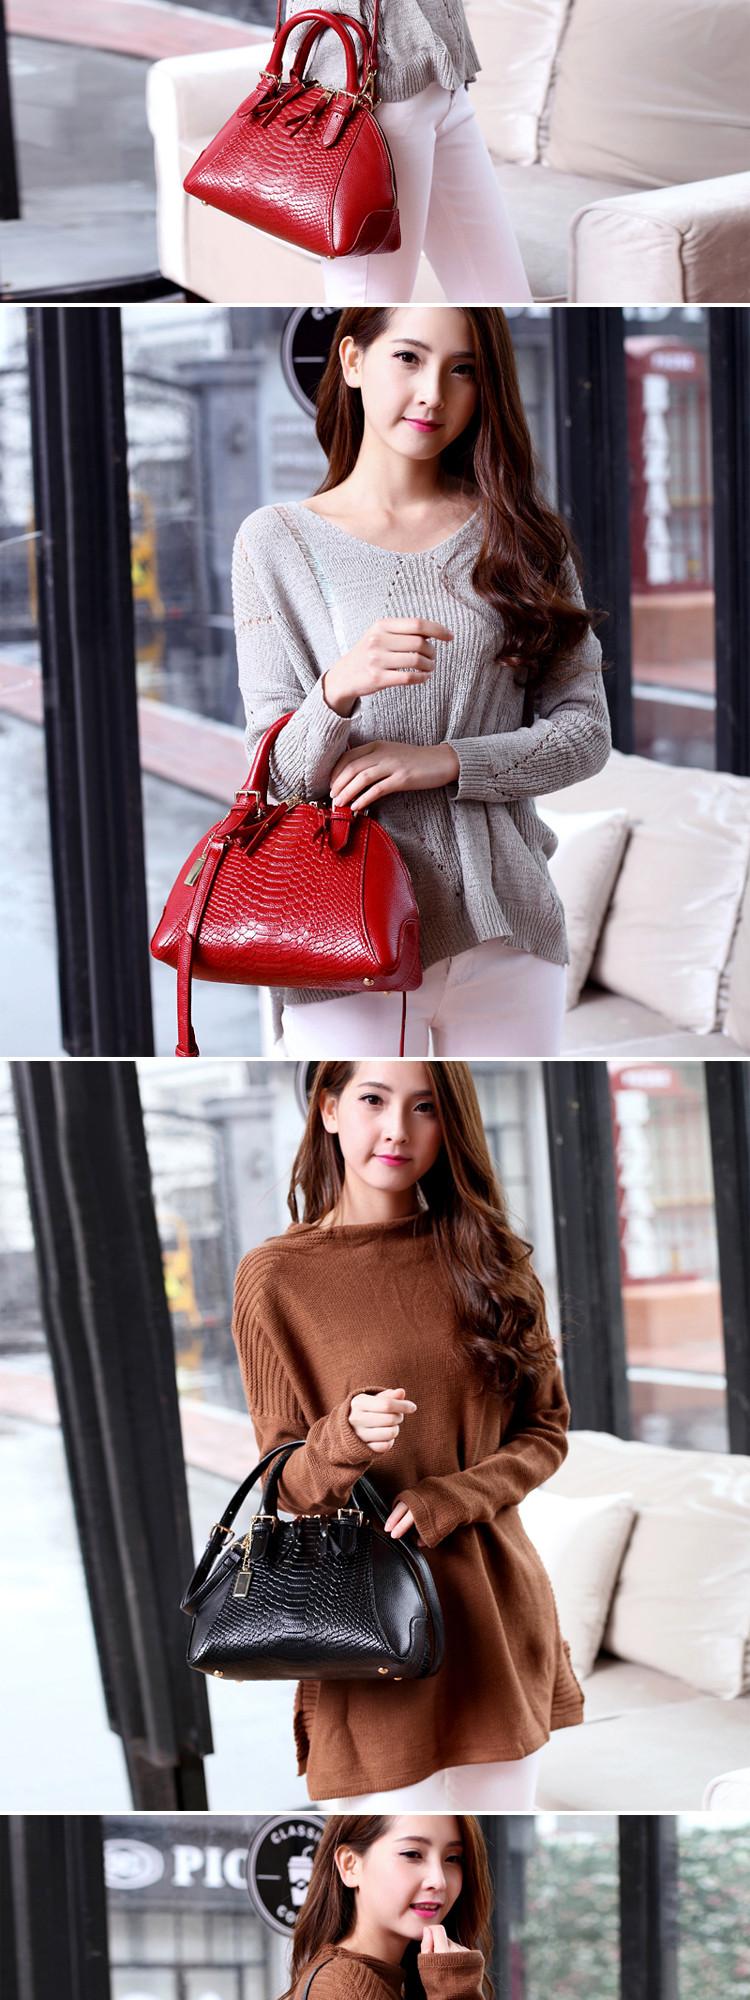 women-handbag10